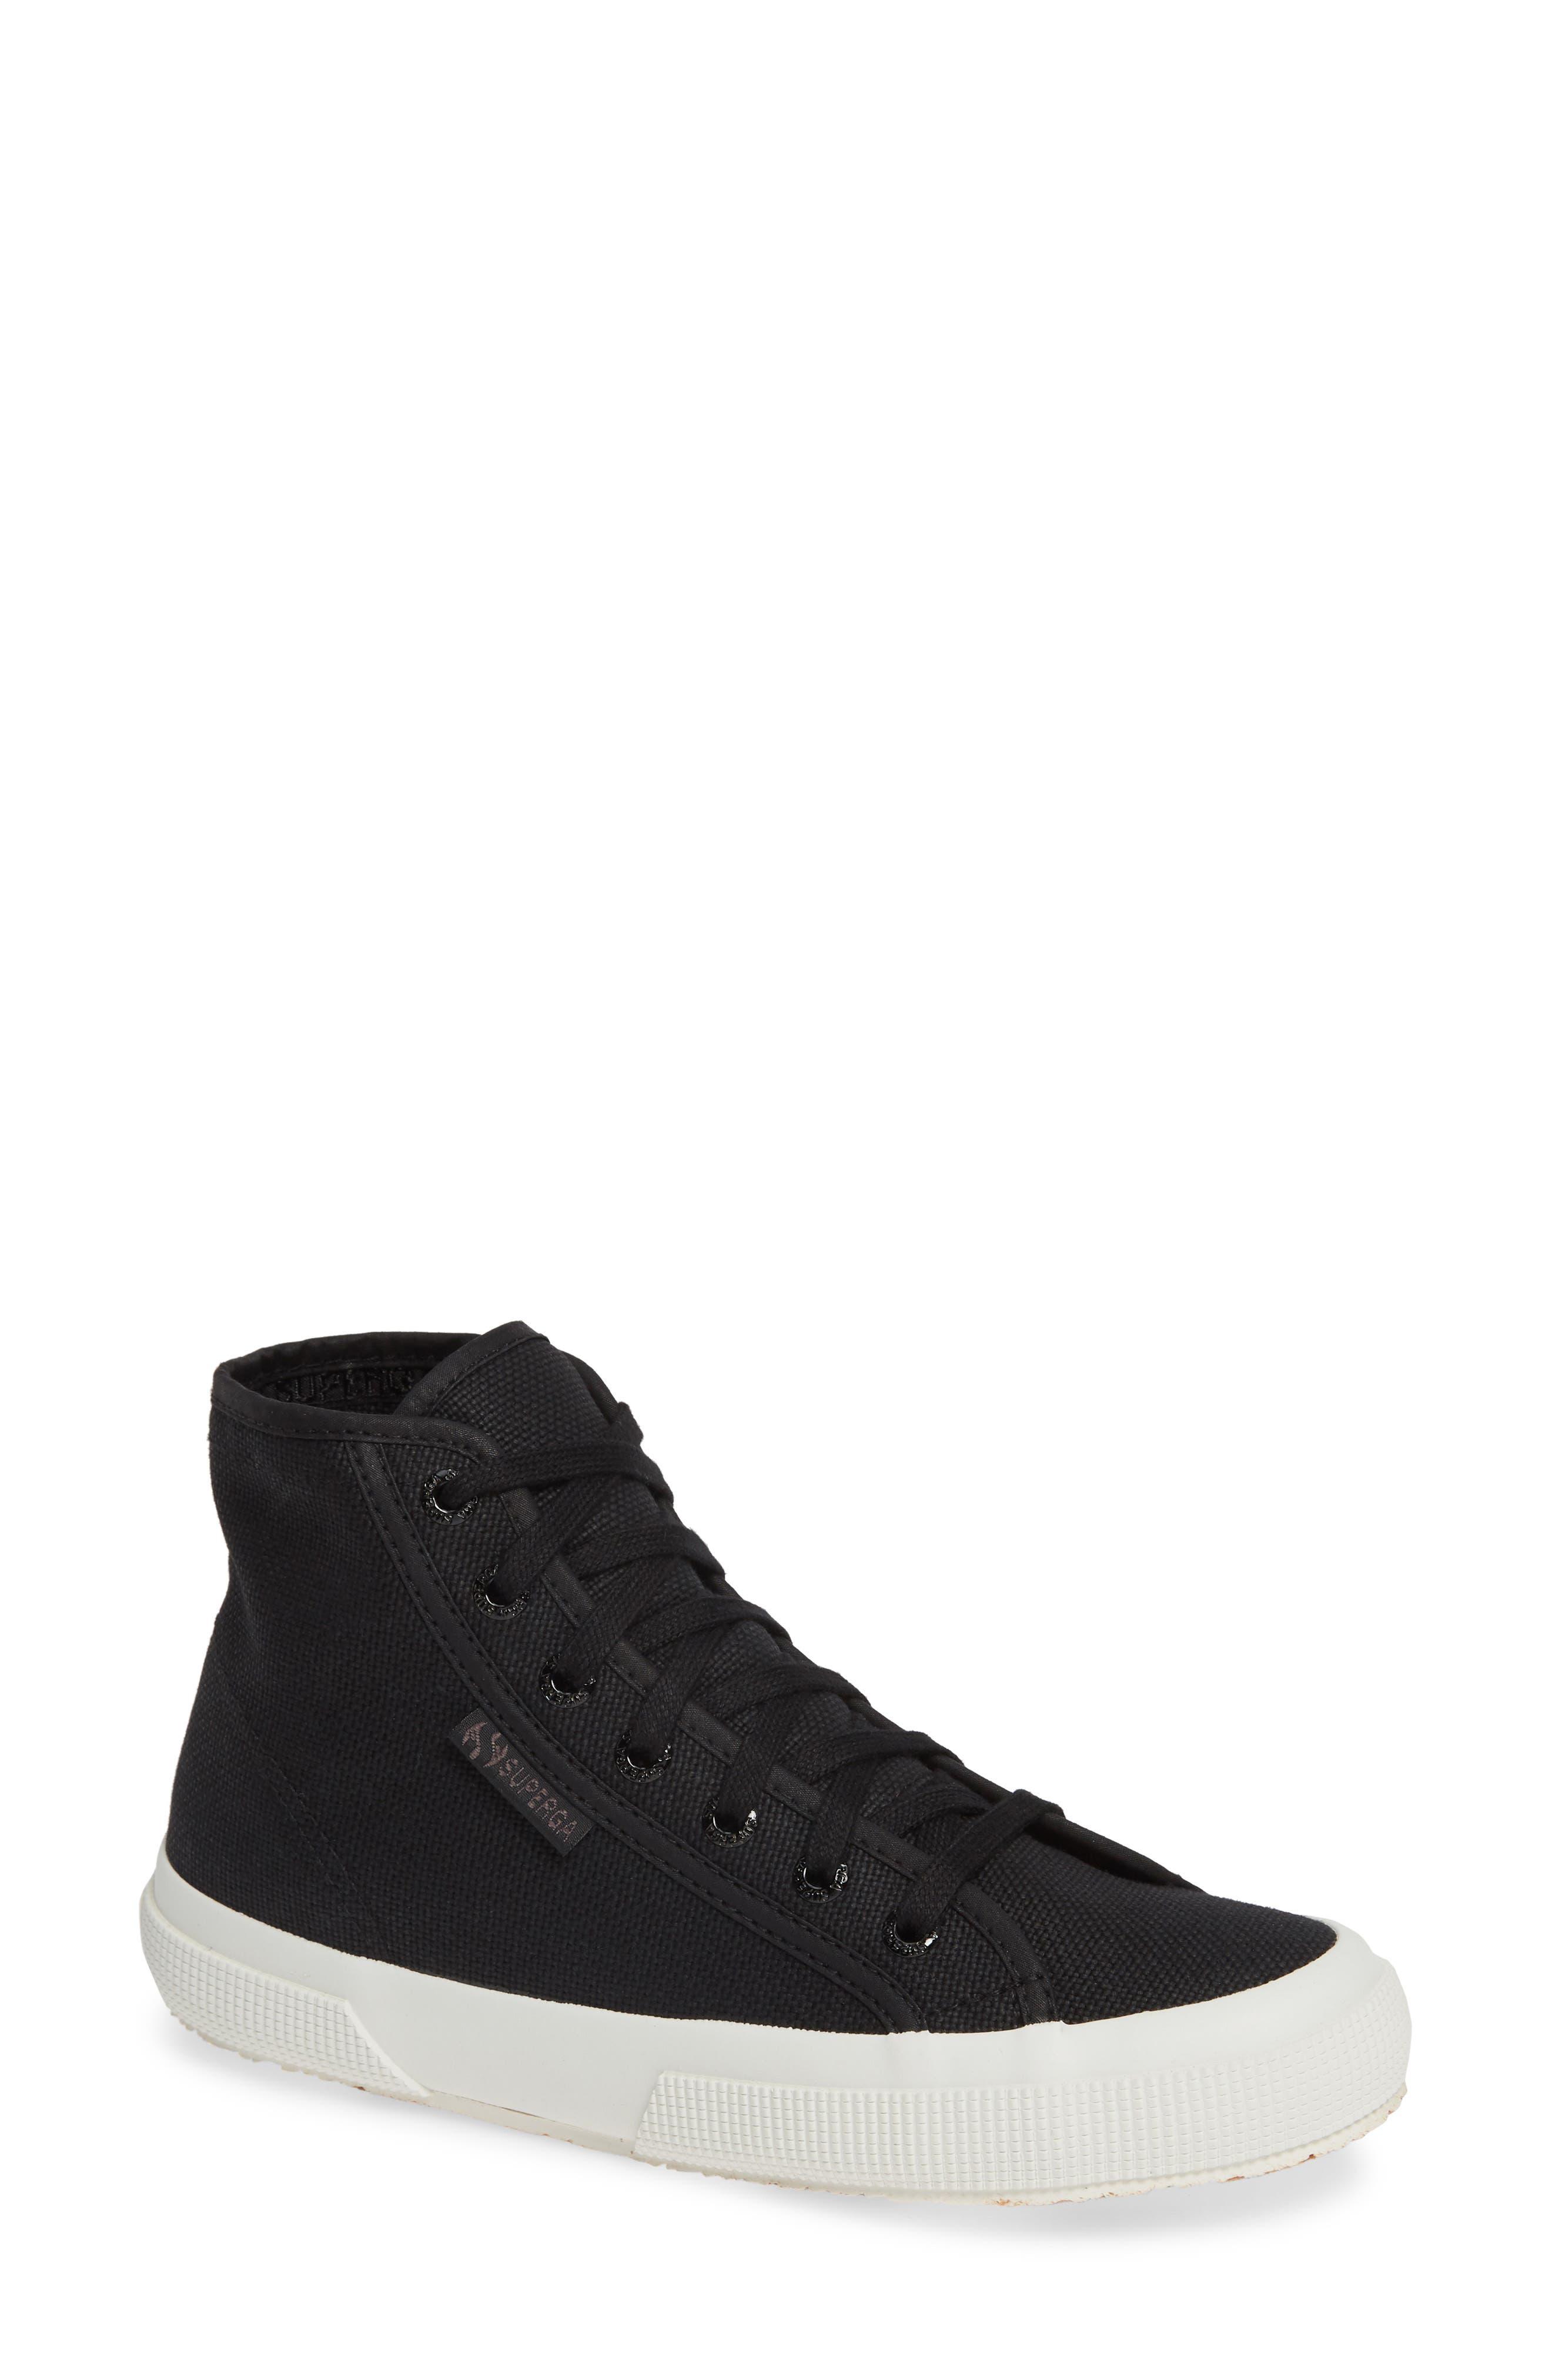 2795 High Top Sneaker,                             Main thumbnail 1, color,                             BLACK/ WHITE